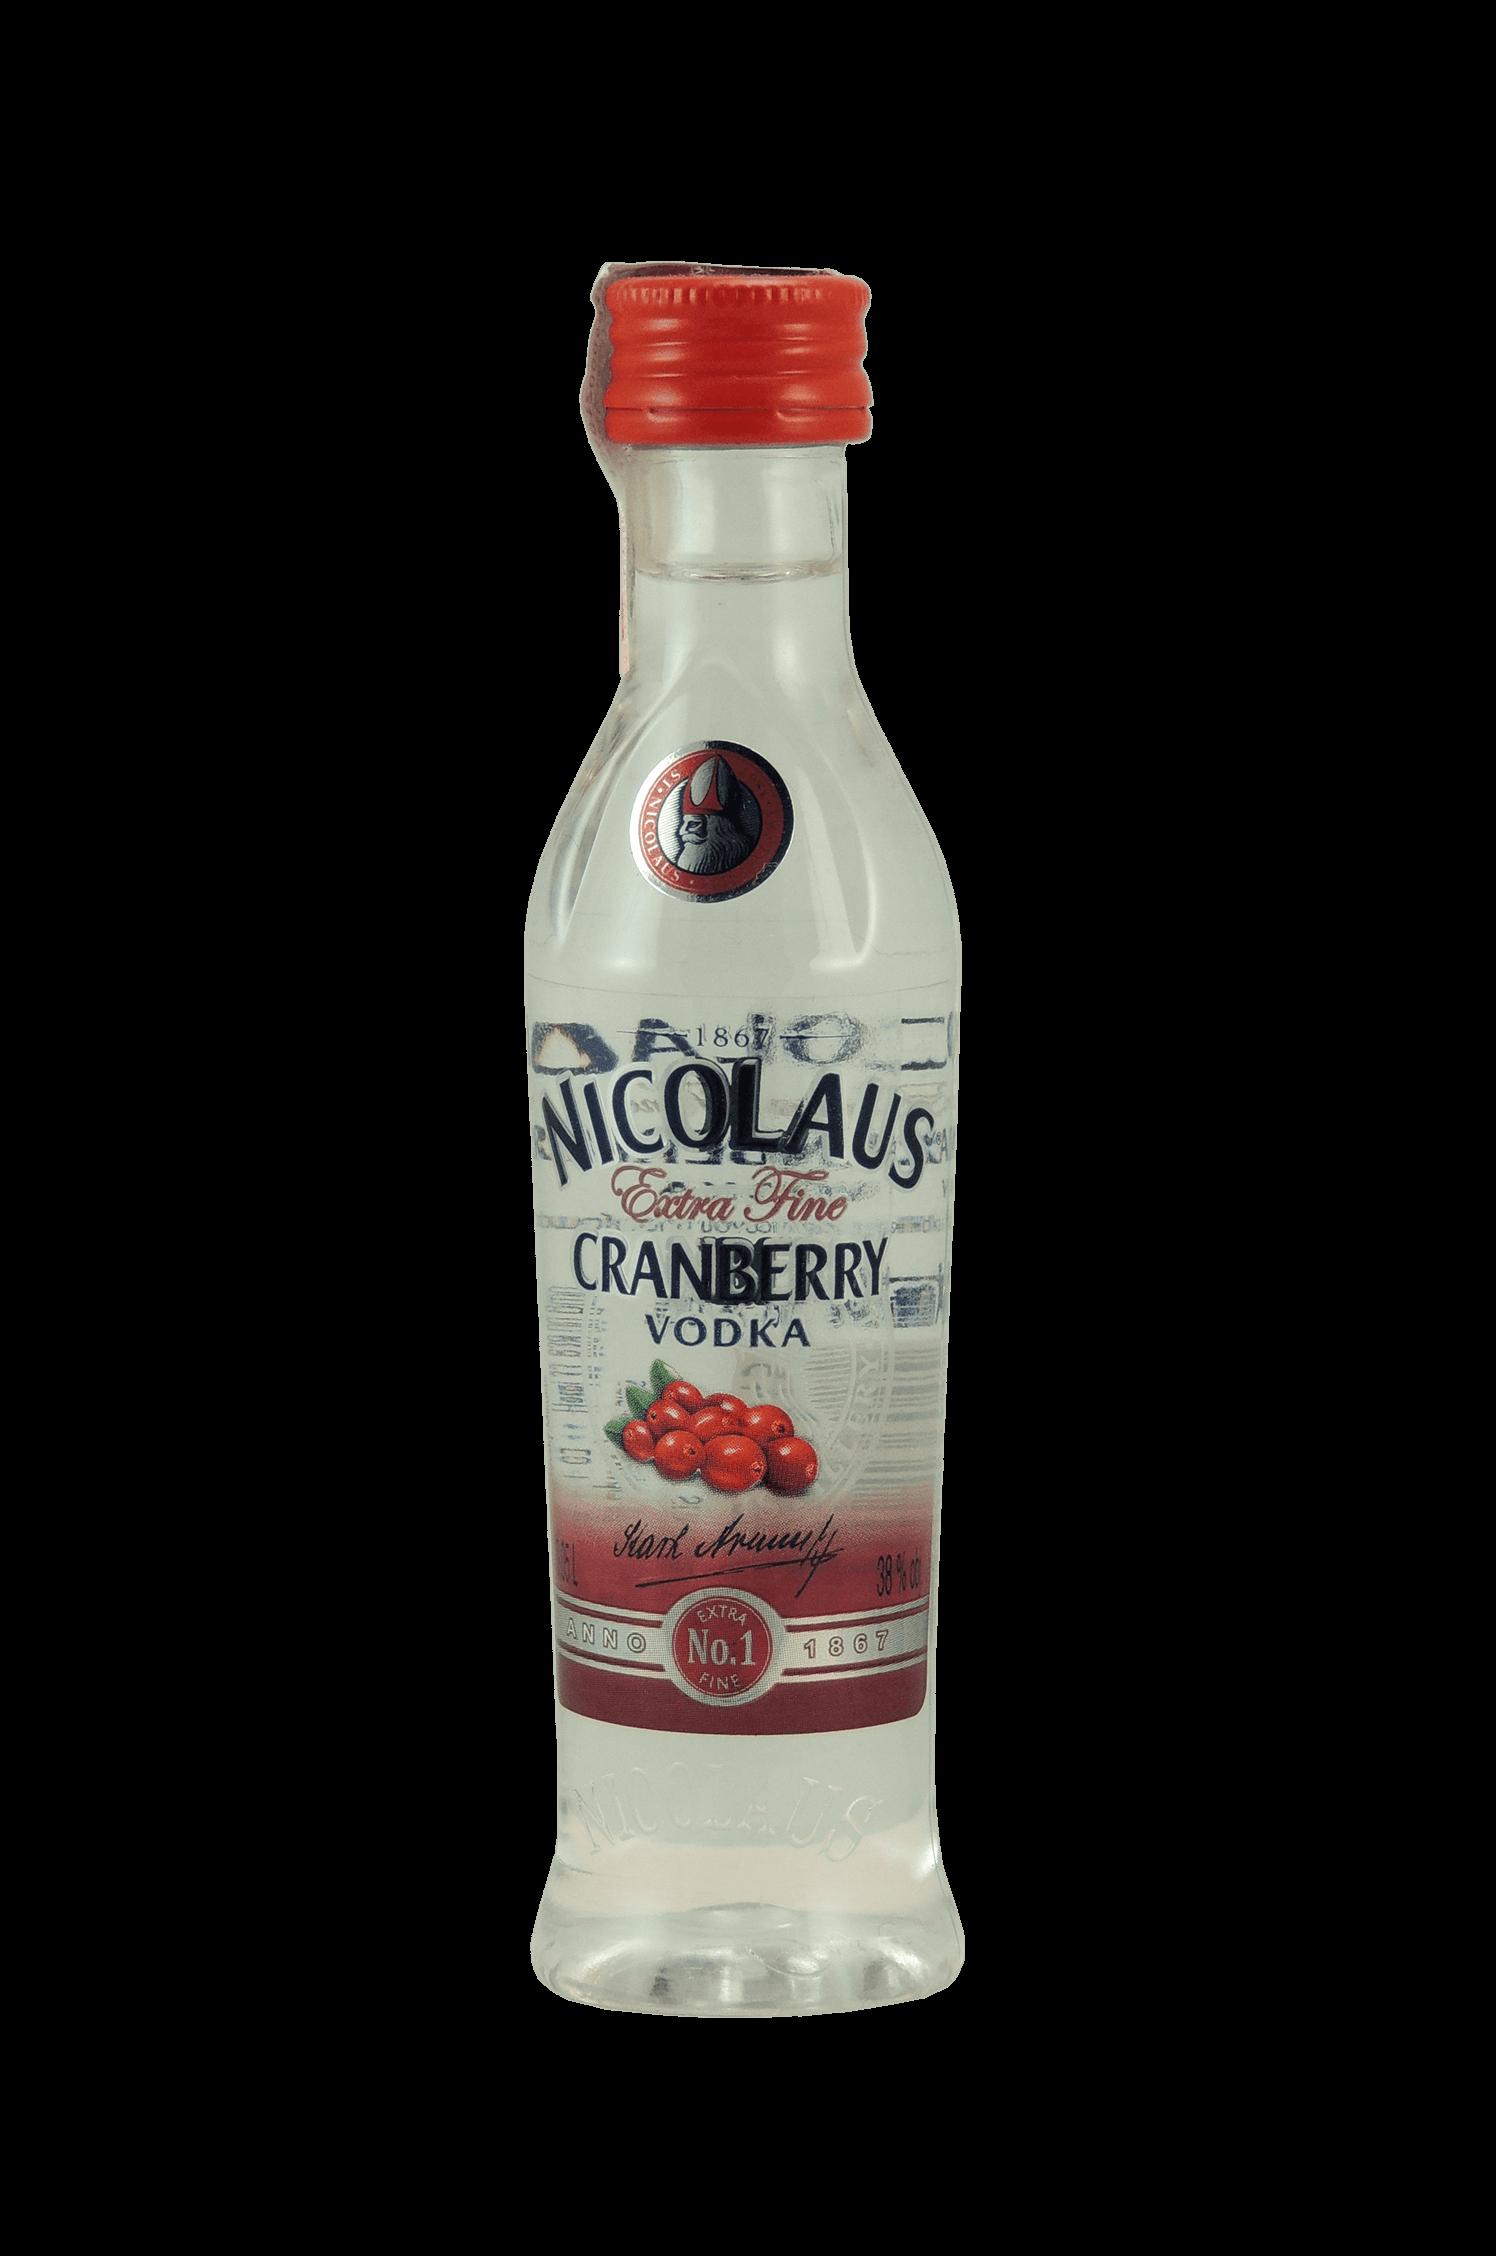 Nicolaus Cranberry Vodka